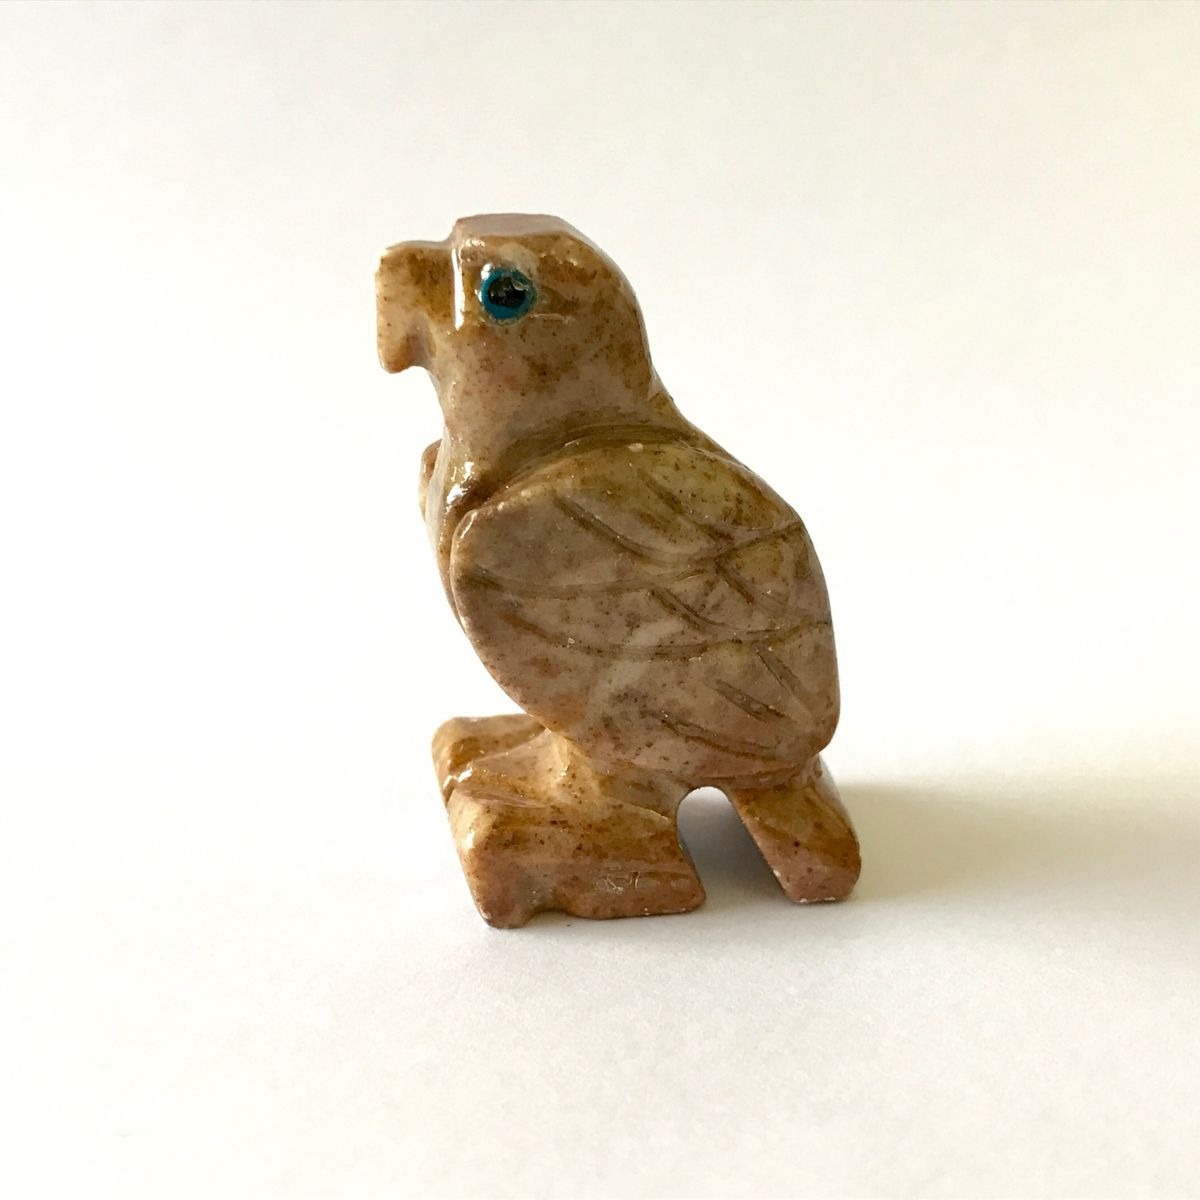 Eagle Stone Carving 4cm